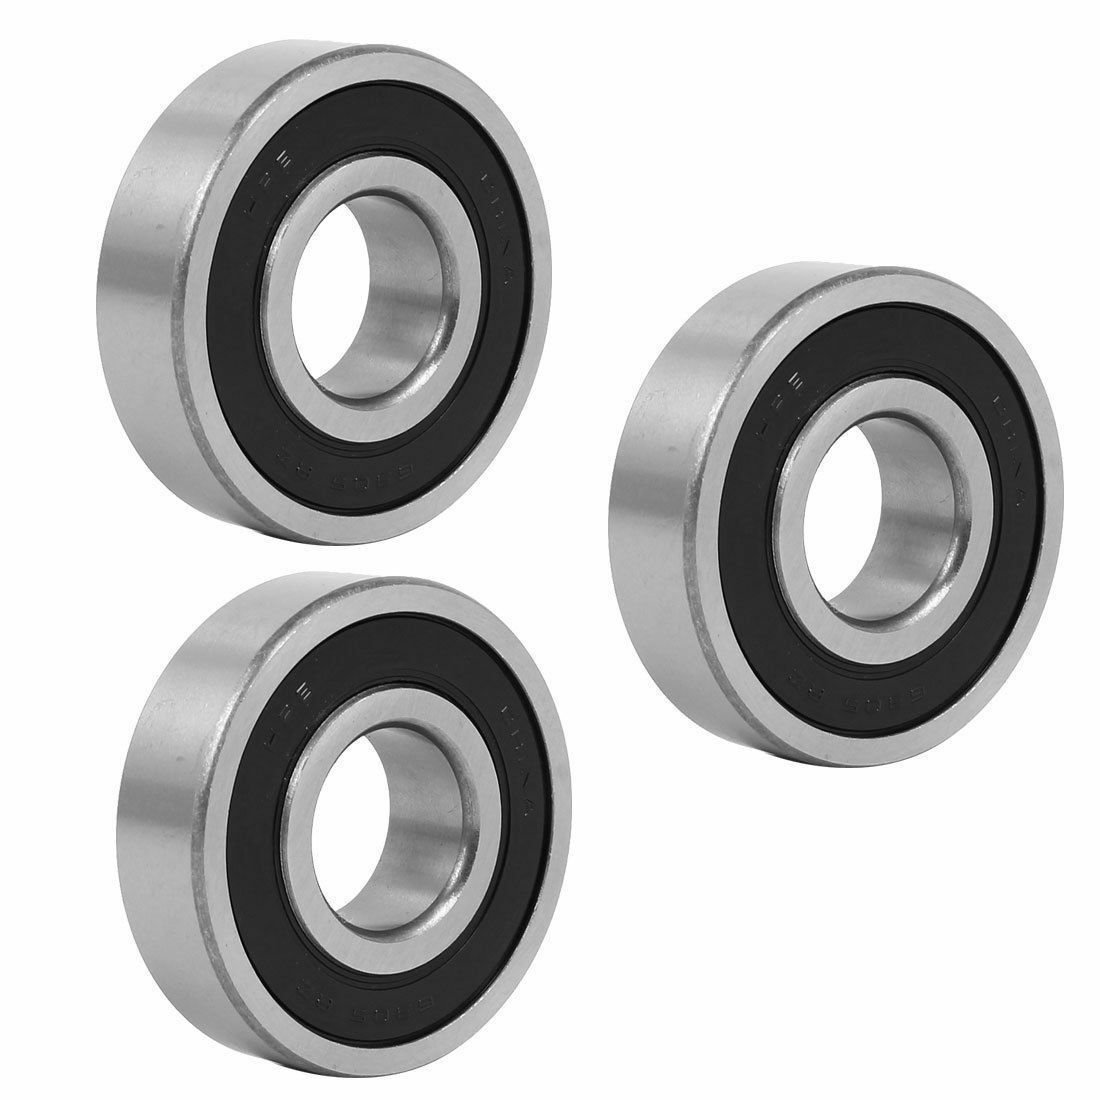 25x62mmx17mm Sealed Deep Groove Rolling Ball Bearings 6305RZ 3pcs.